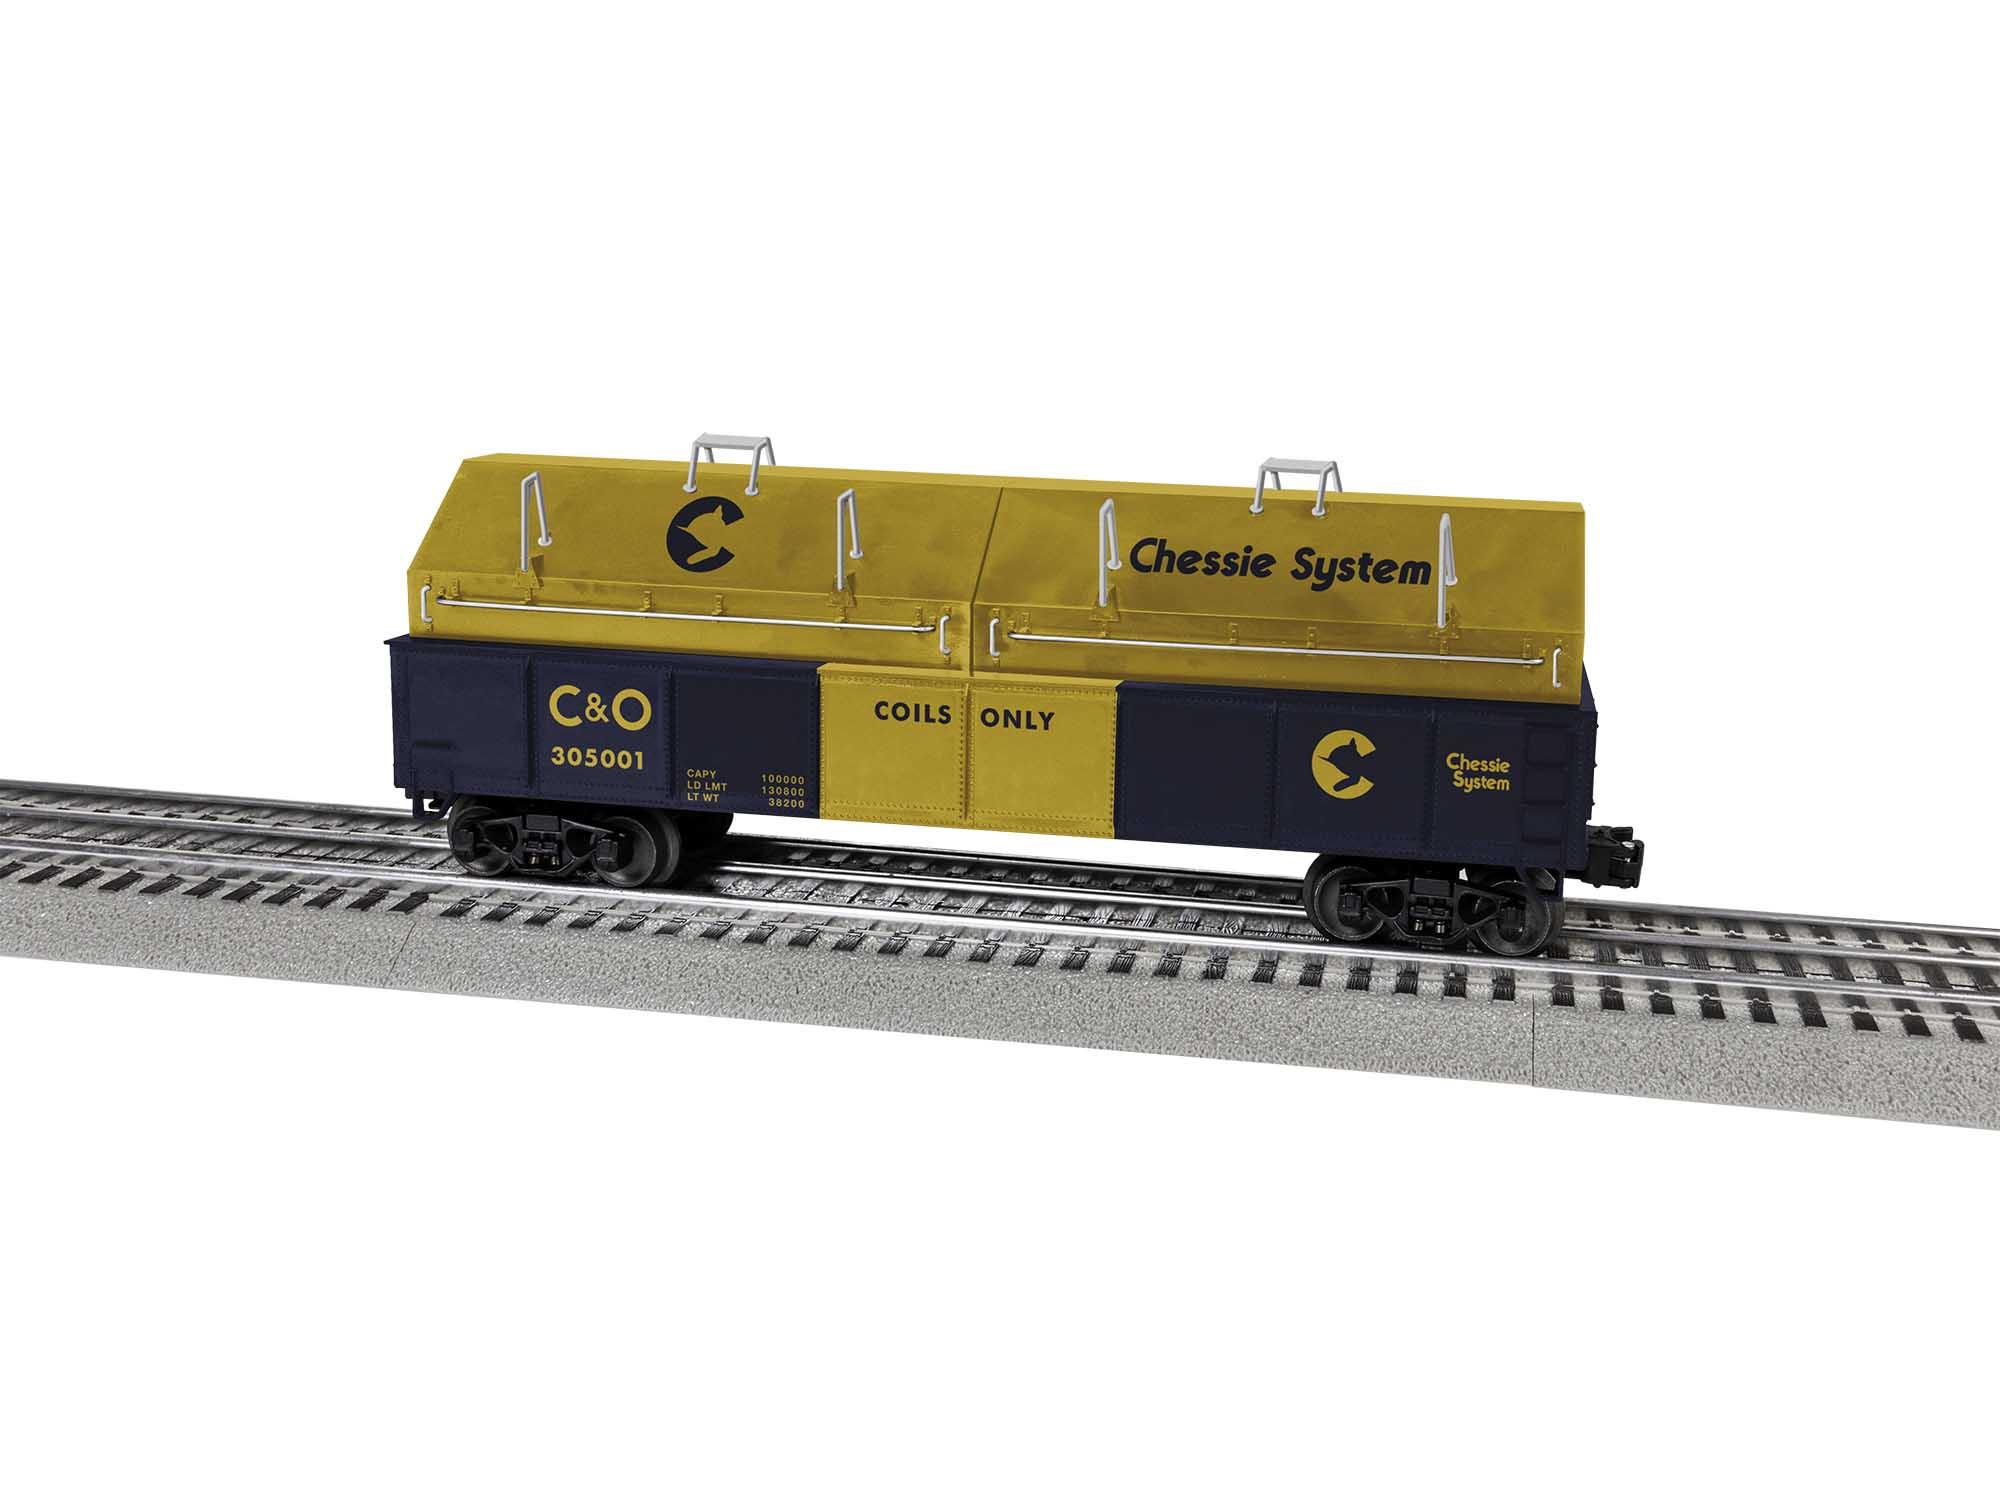 Lionel 2043141 O Gondola Chessie System #305001